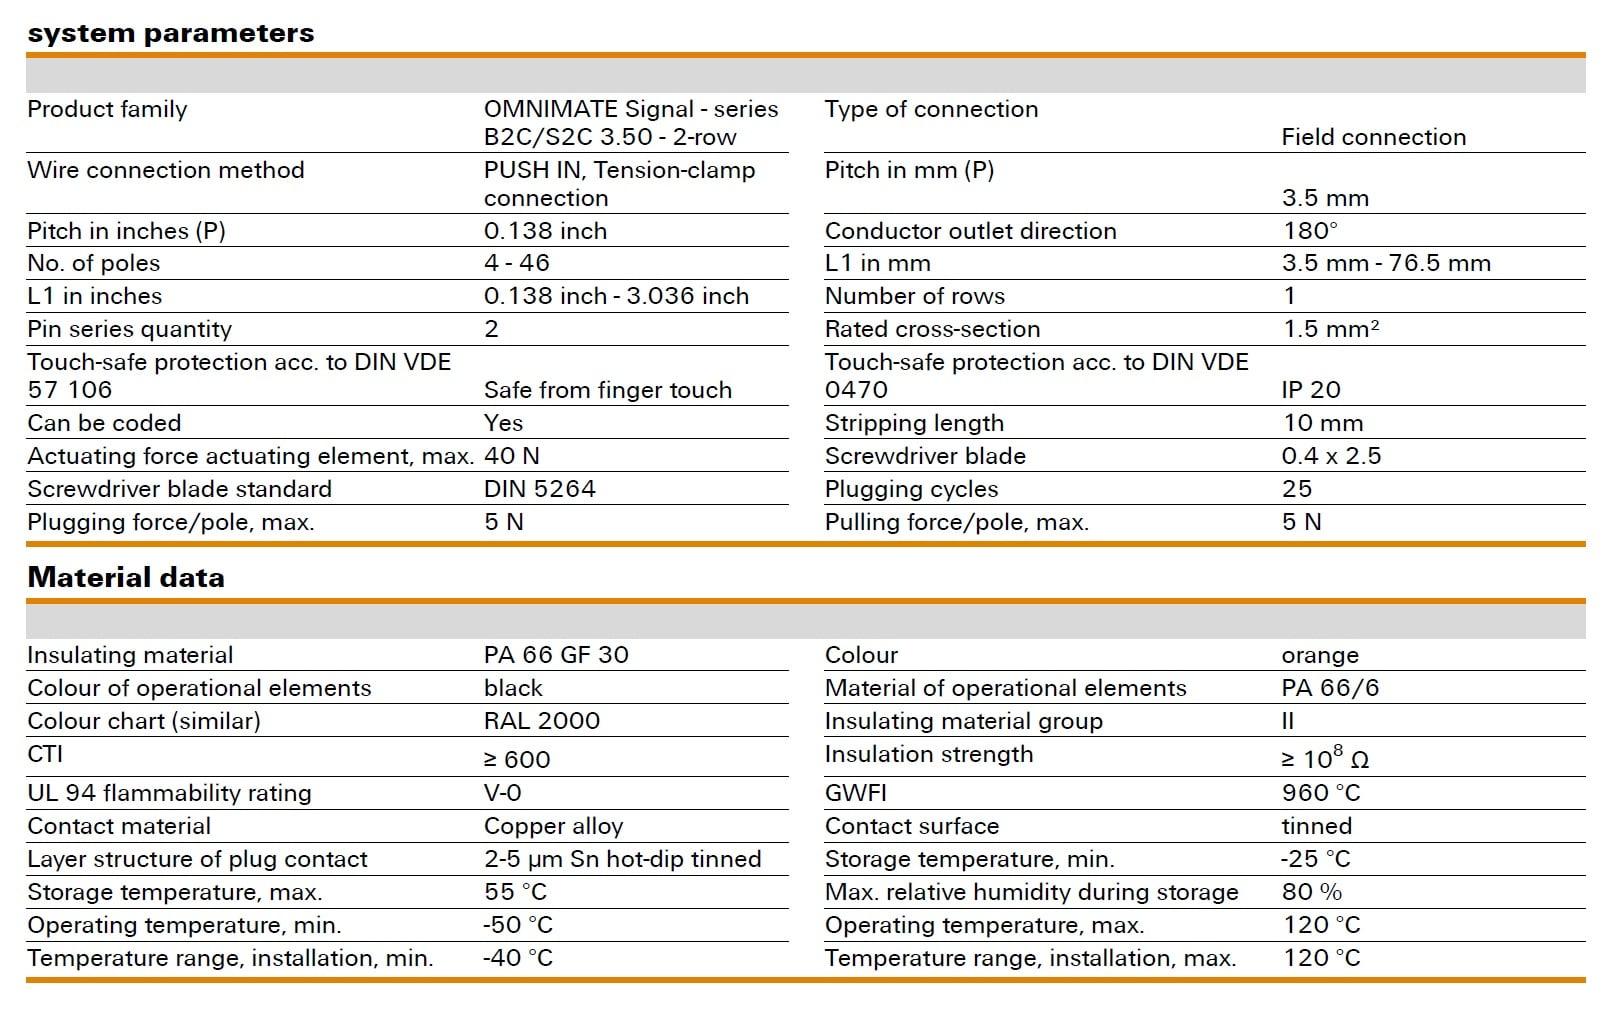 Weidmüller B2CF 3.50/180 Specifications